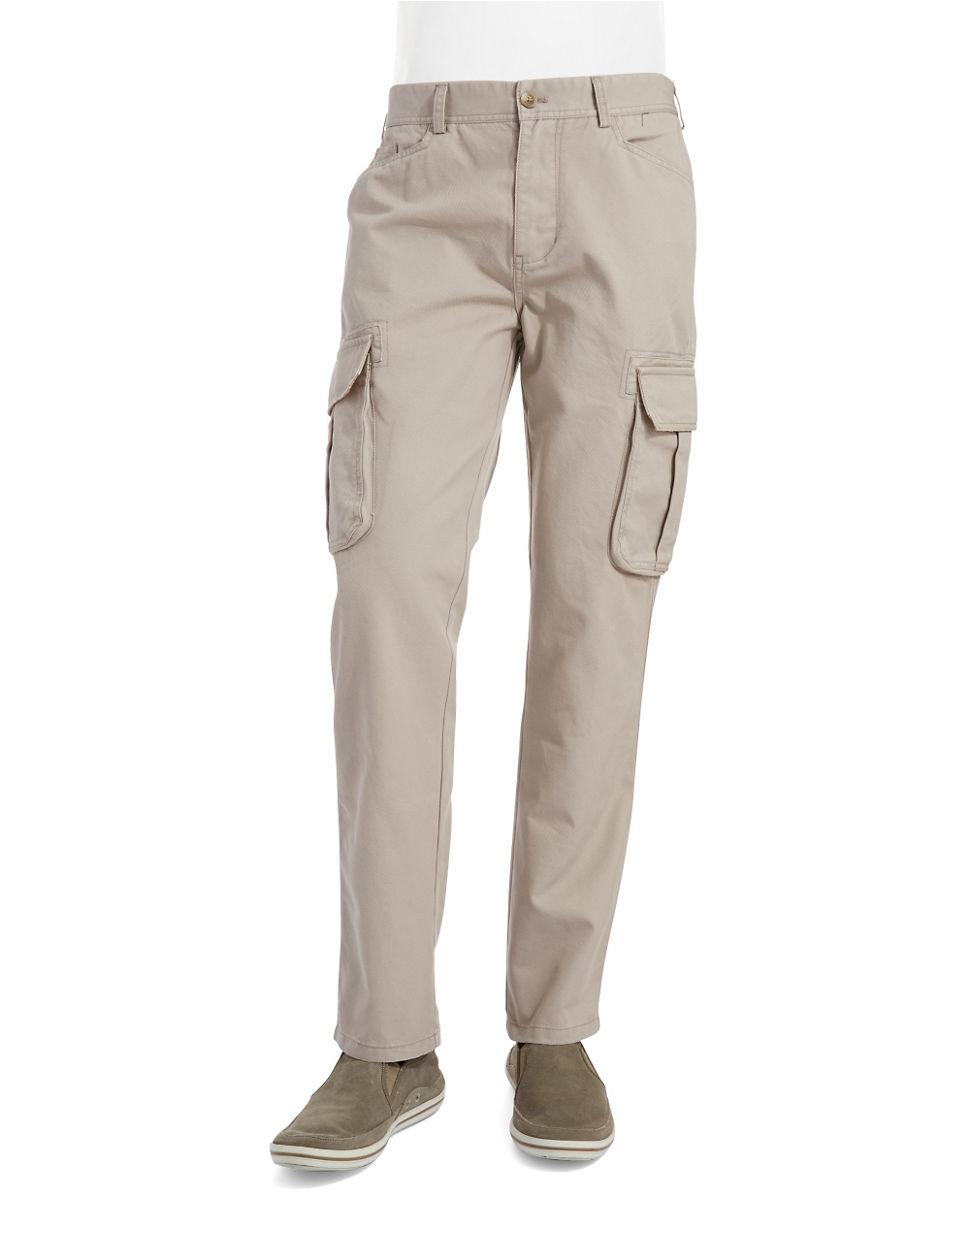 Elegant 25+ Great Ideas About Cargo Pants On Pinterest